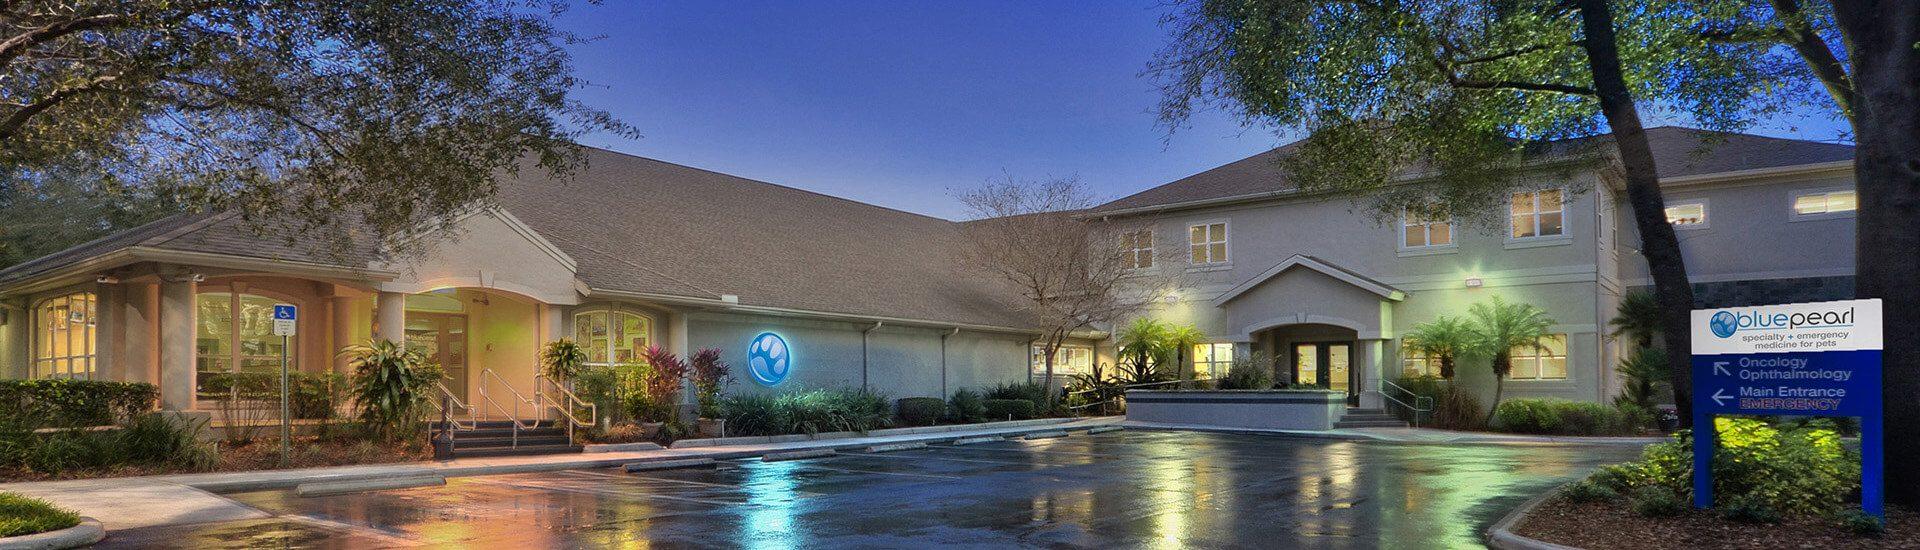 BluePearl Pet Hospital   Tampa, FL   24/7 Emergency Vet